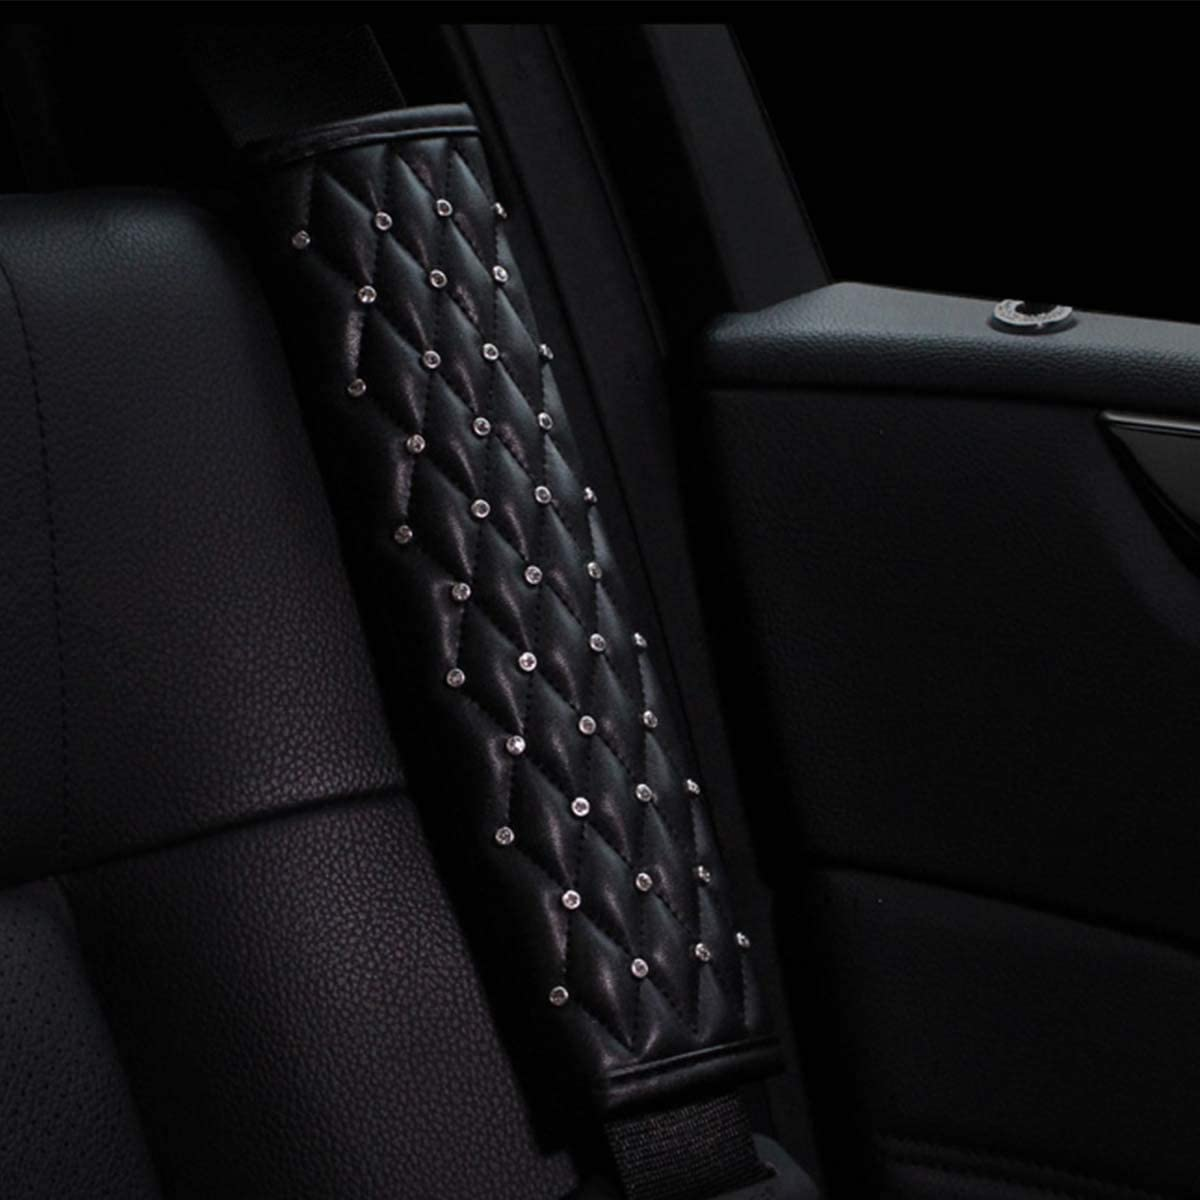 QINU 5pcs//Set Bling Bling Car Seat Belt Covers /& Diamond Gear Shift Knob Cover /& Crystal Handbrake Cover Set Diamond Auto Interior Decor Accessories for Women 5pcs//Set - Full Crystal